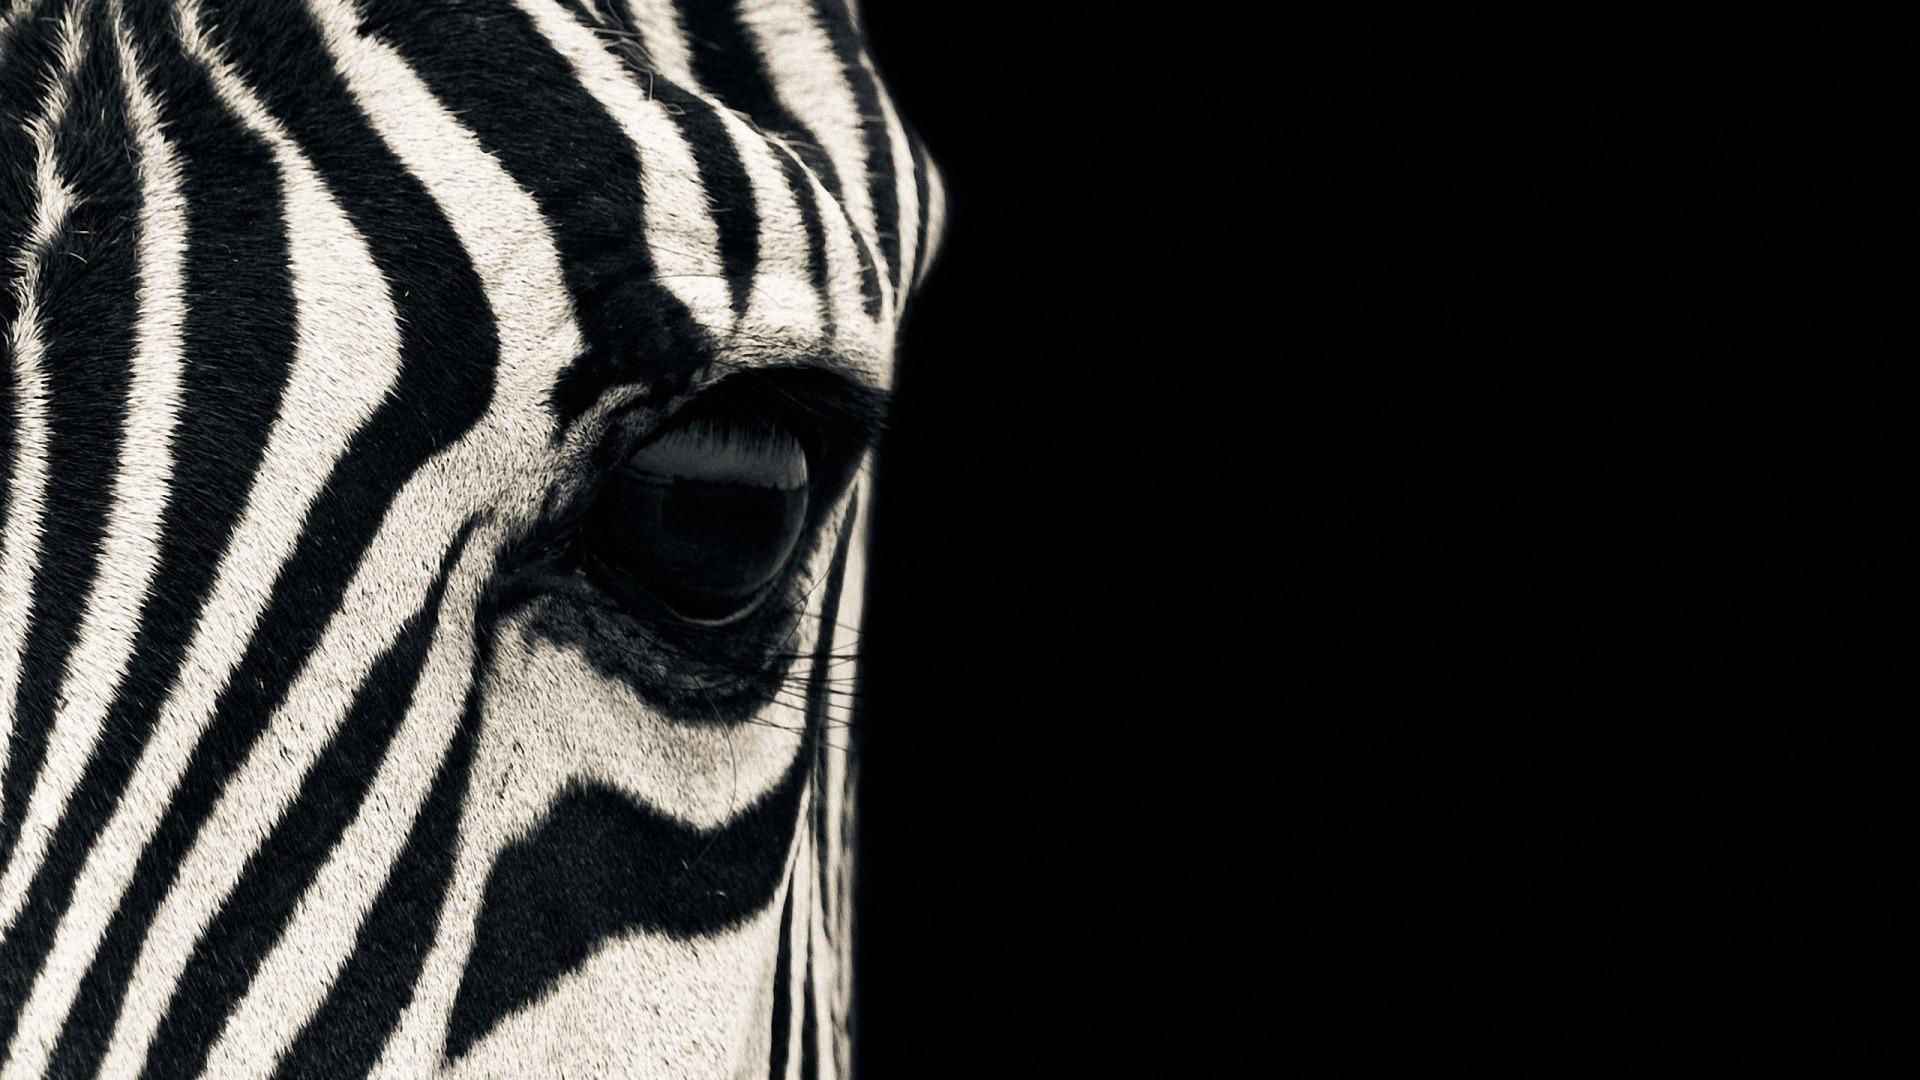 Zebra wallpapers pictures images for Zebra wallpaper